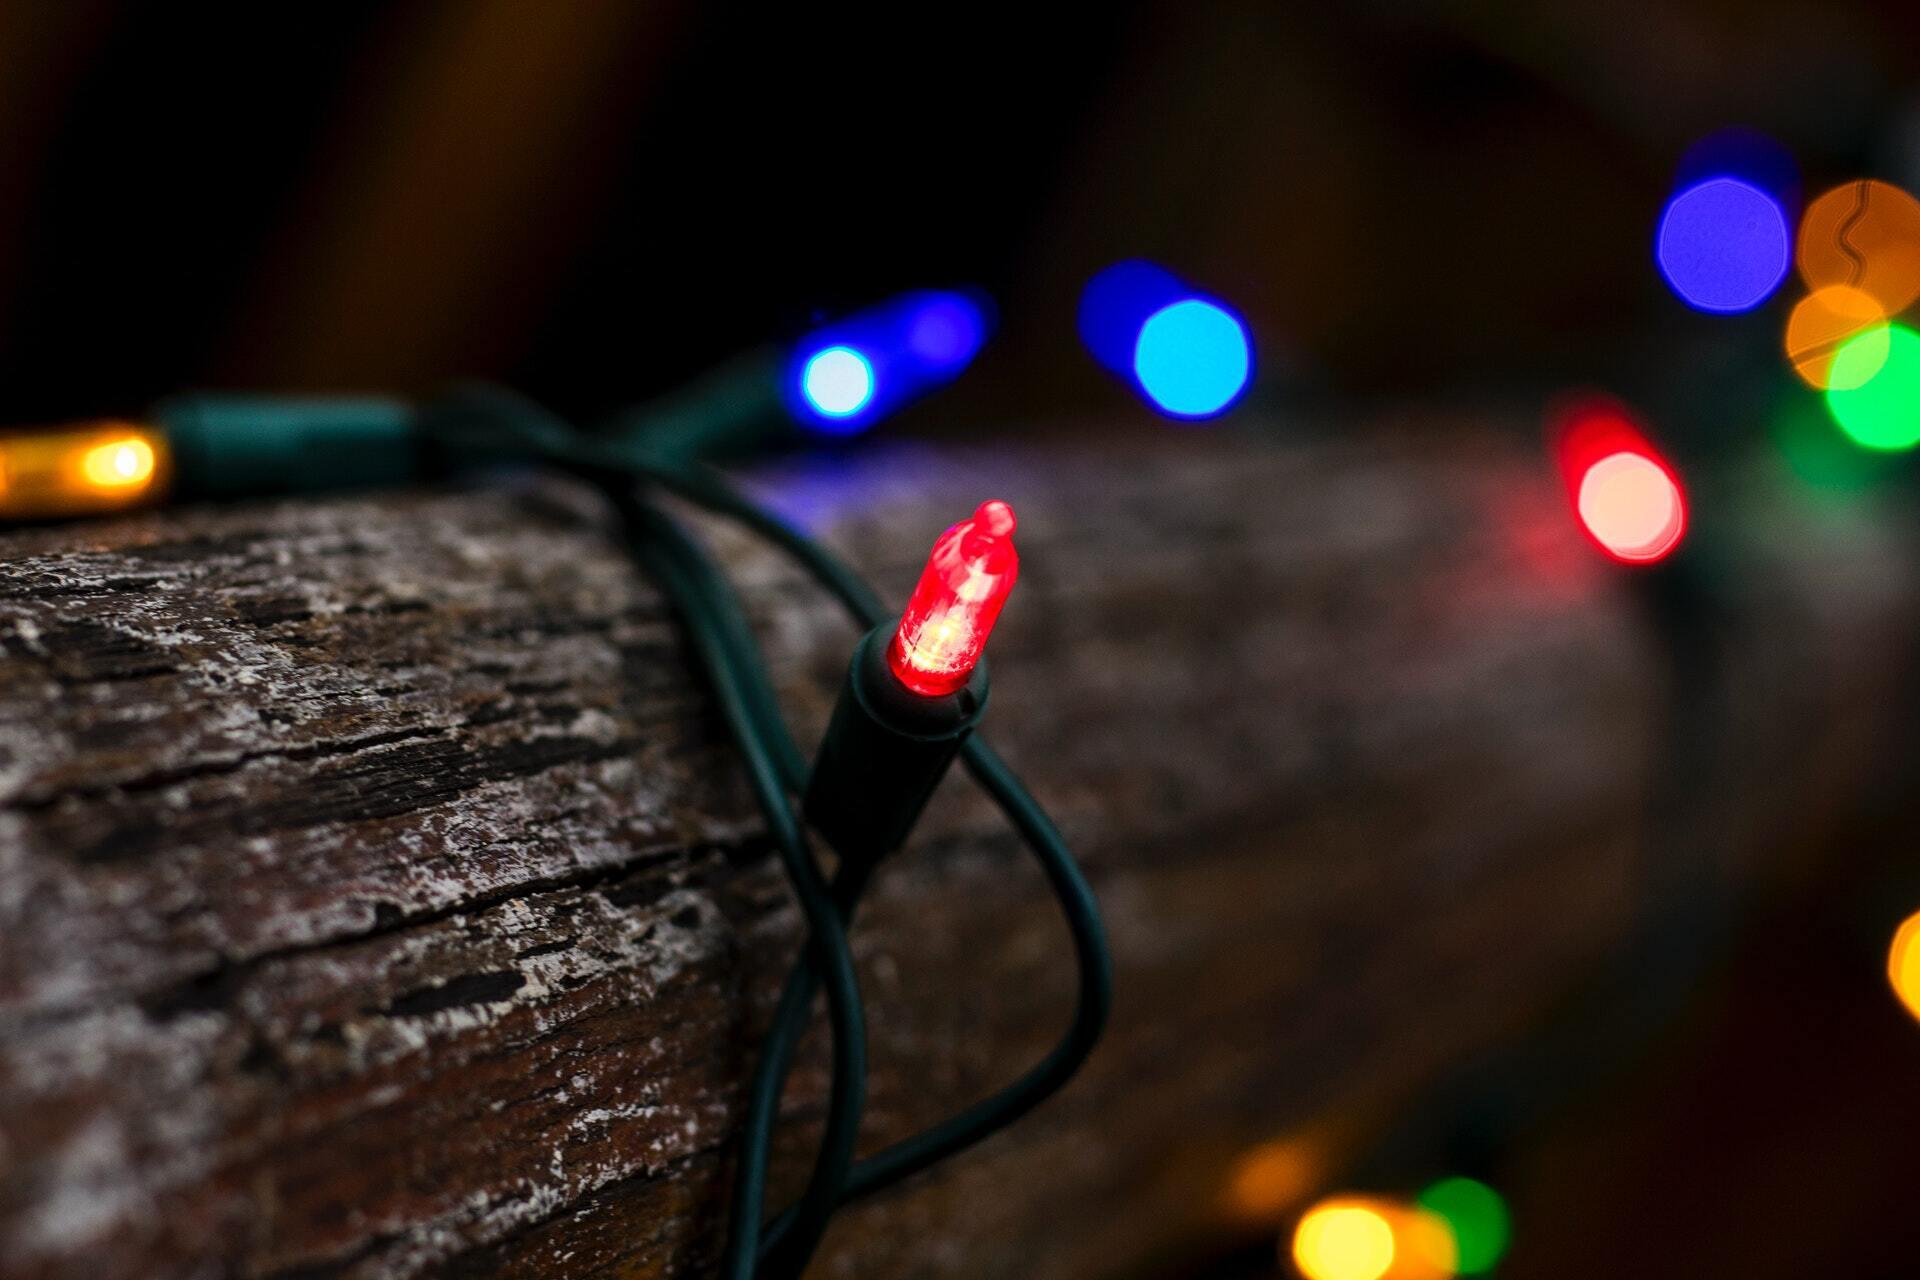 BETA04: It's Christmastime